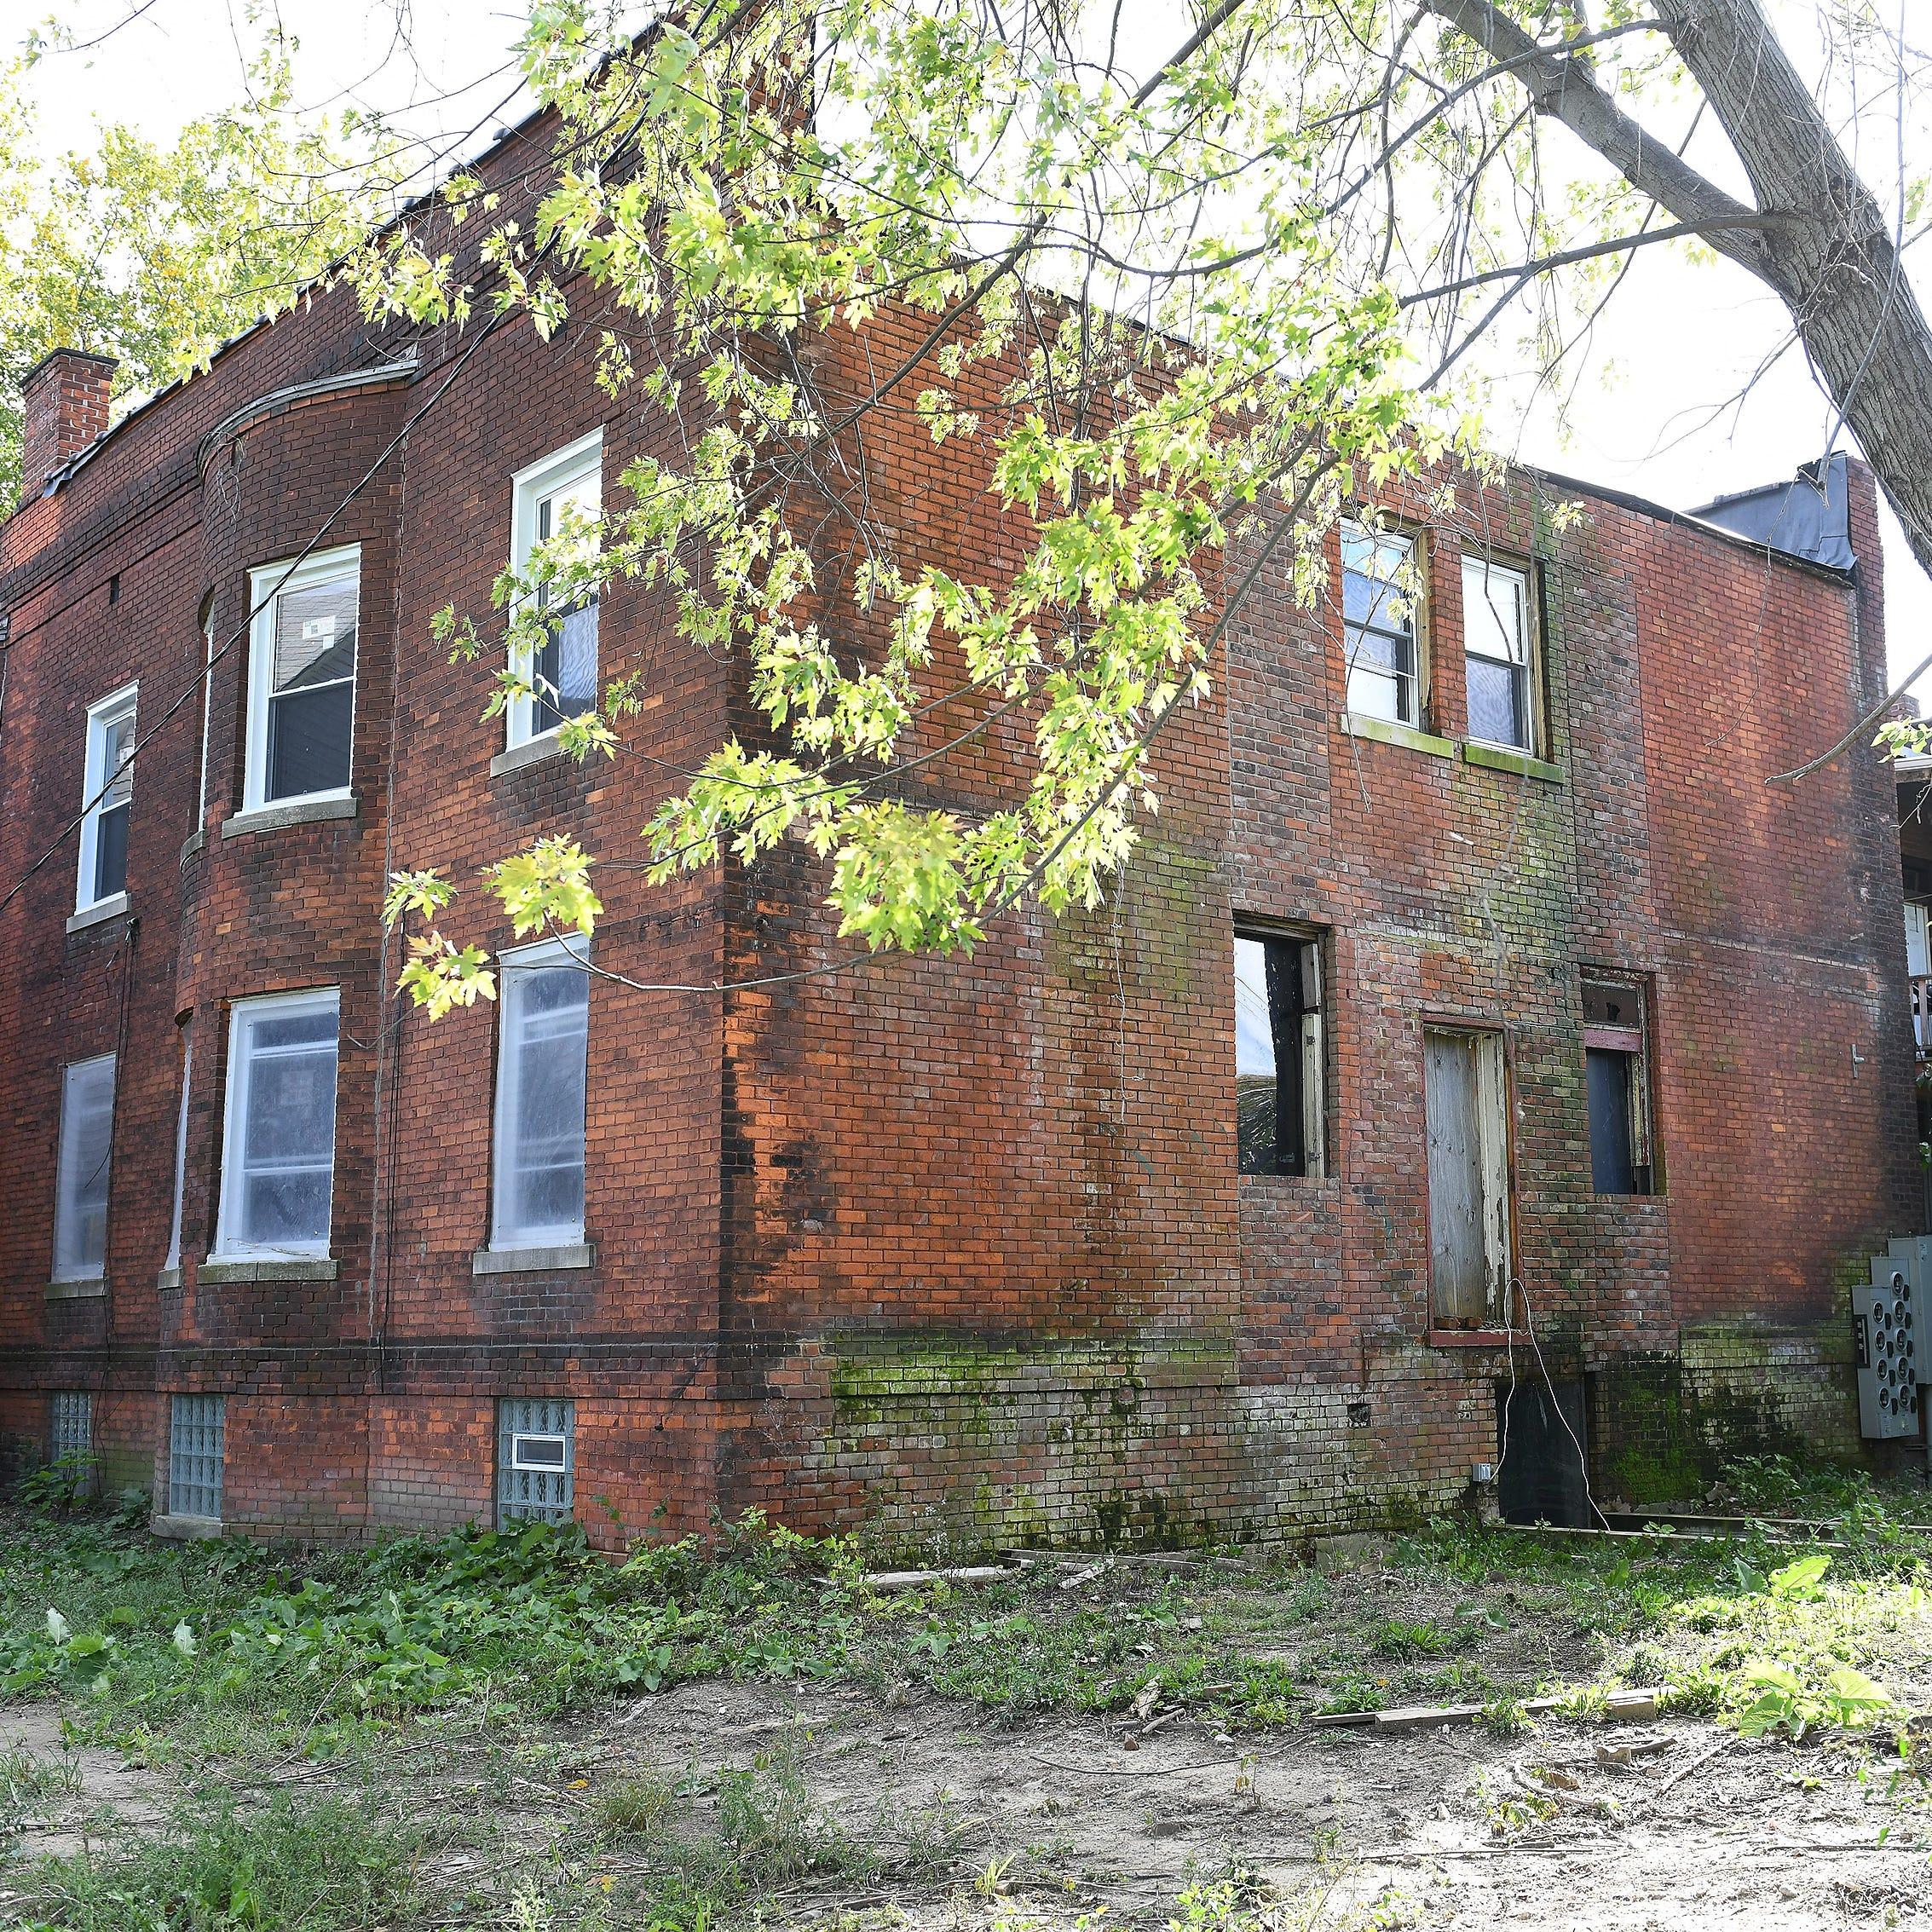 Land bank lets Gilchrist keep blighted Detroit building after weekend cleanup